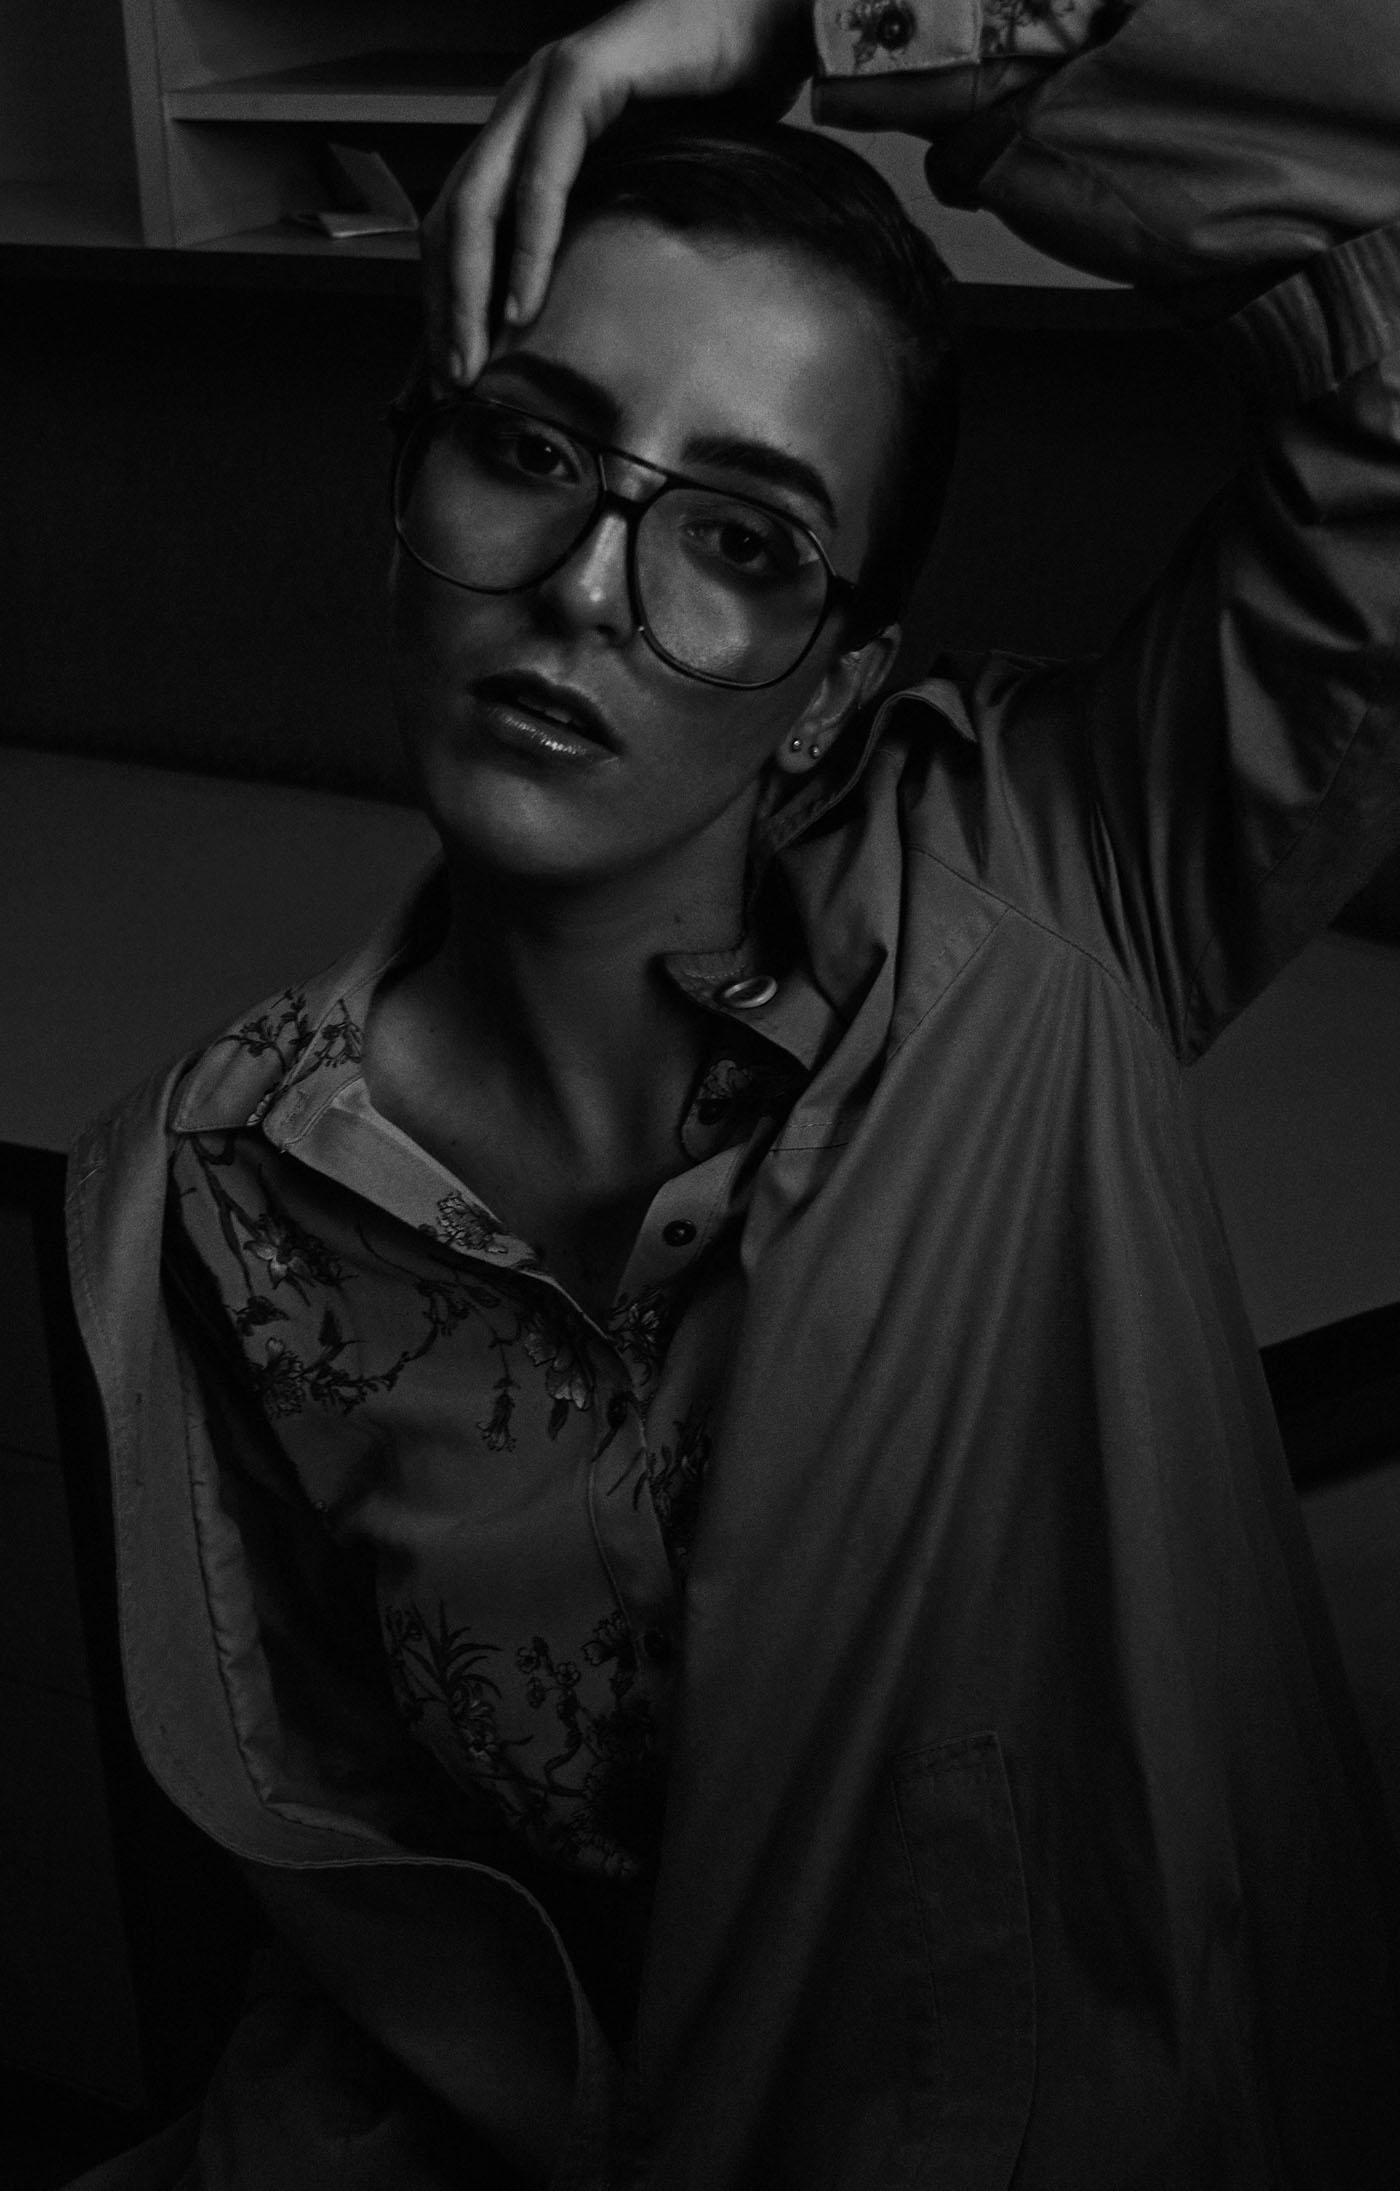 photo shoot bnw model art editorial magazine fashionphotography portrait vogue